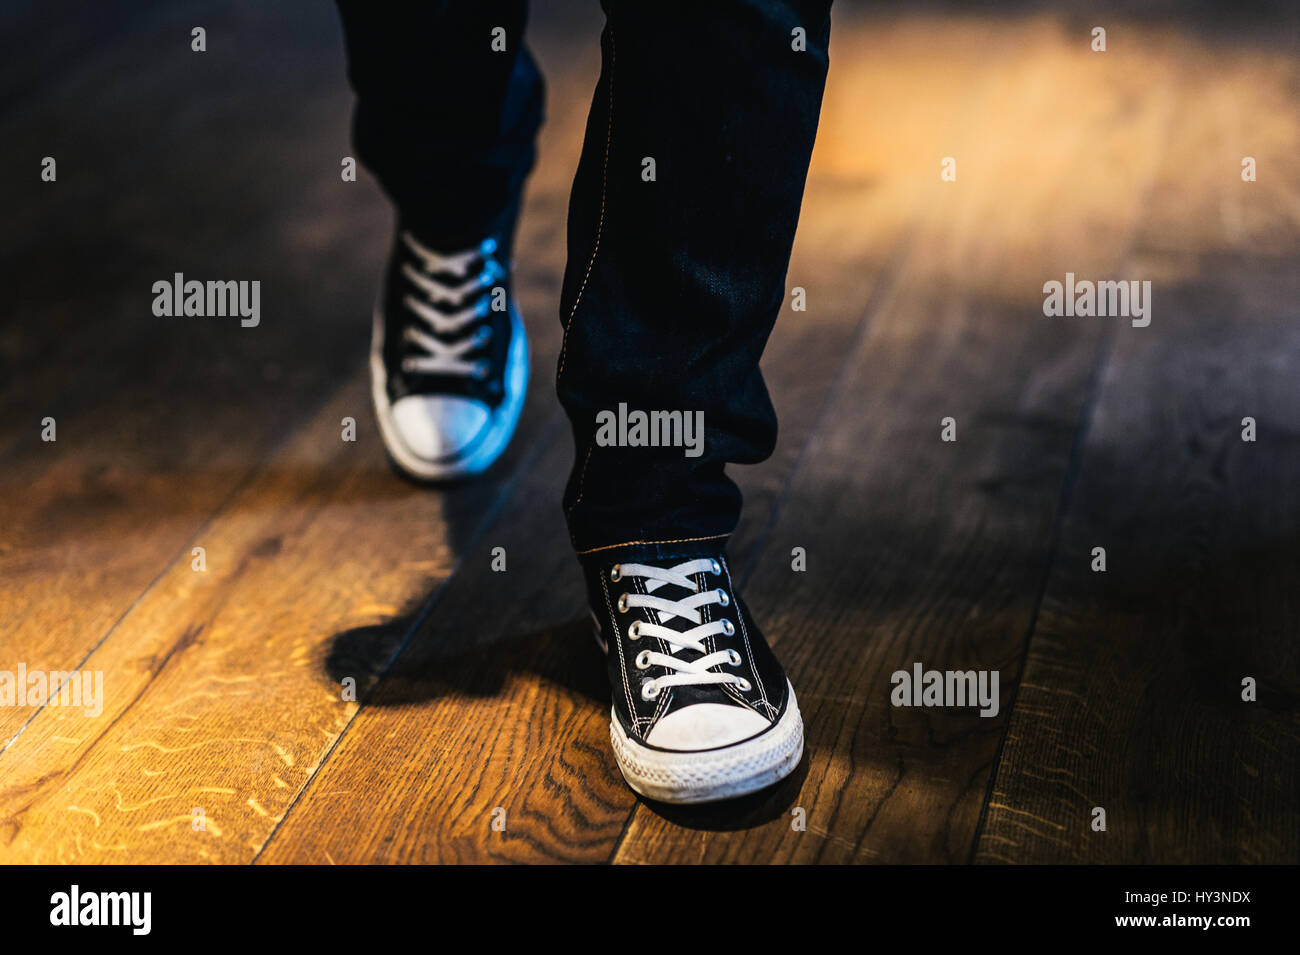 b4825ffeed3 Converse Legs Stock Photos   Converse Legs Stock Images - Alamy